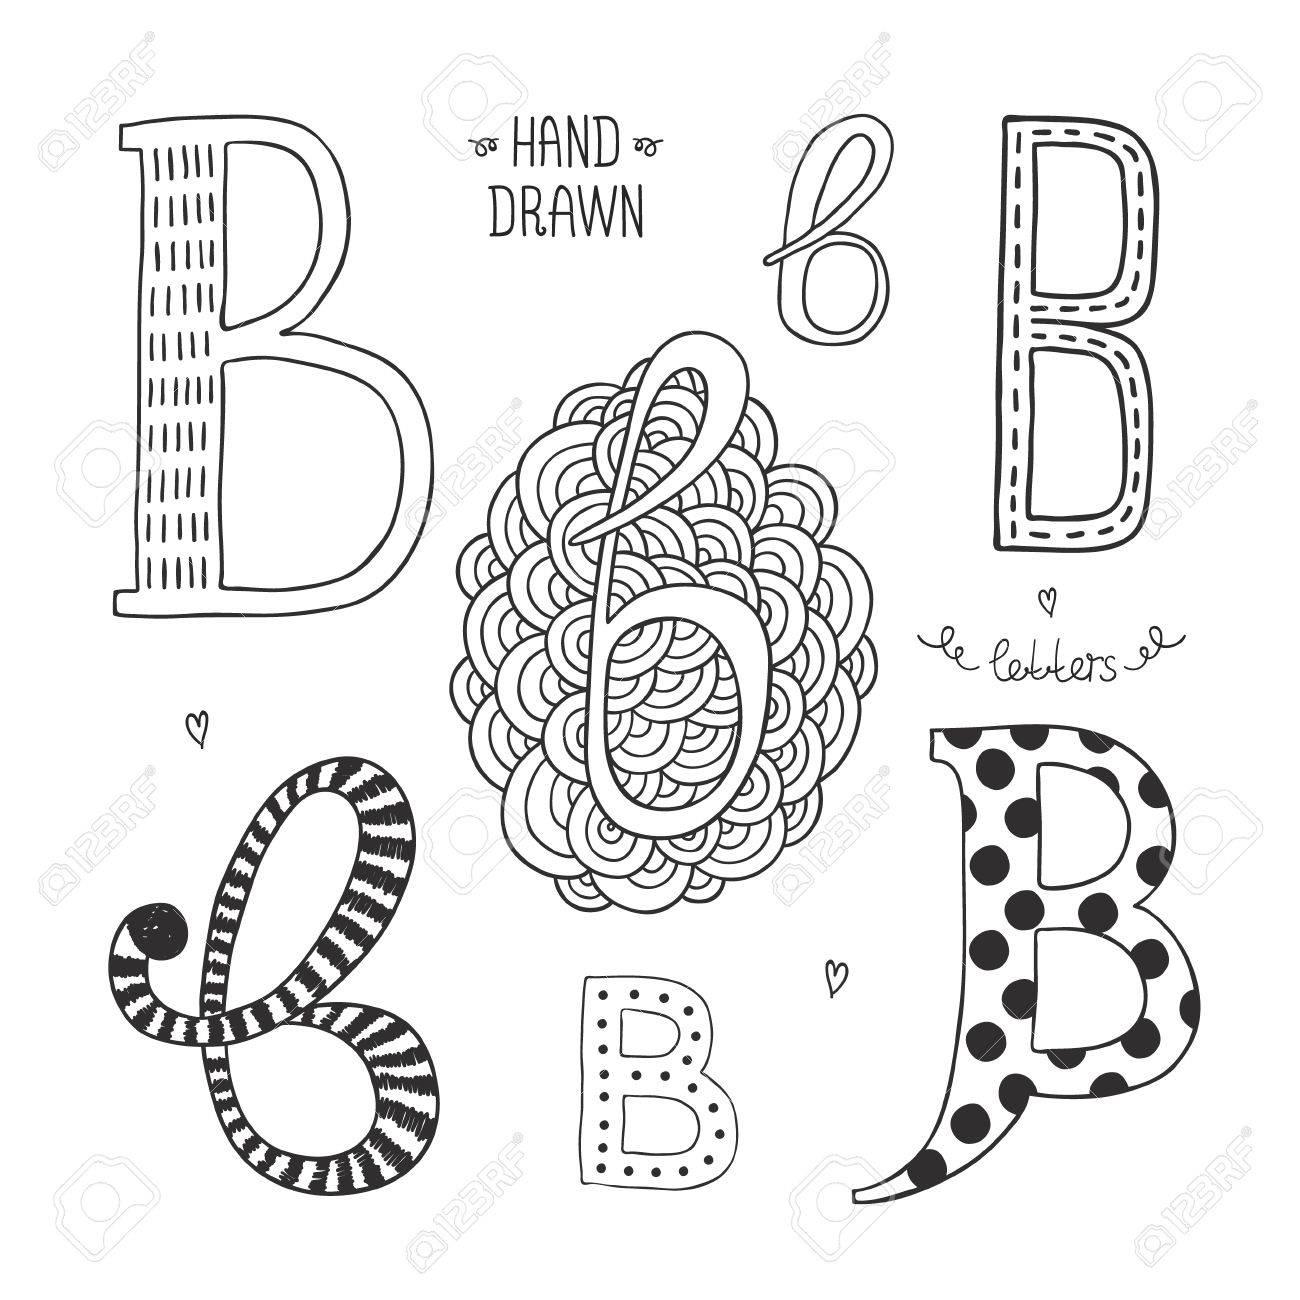 Vector hand drawn alphabet letter b doodle letters set isolated vector vector hand drawn alphabet letter b doodle letters set isolated on white background altavistaventures Image collections